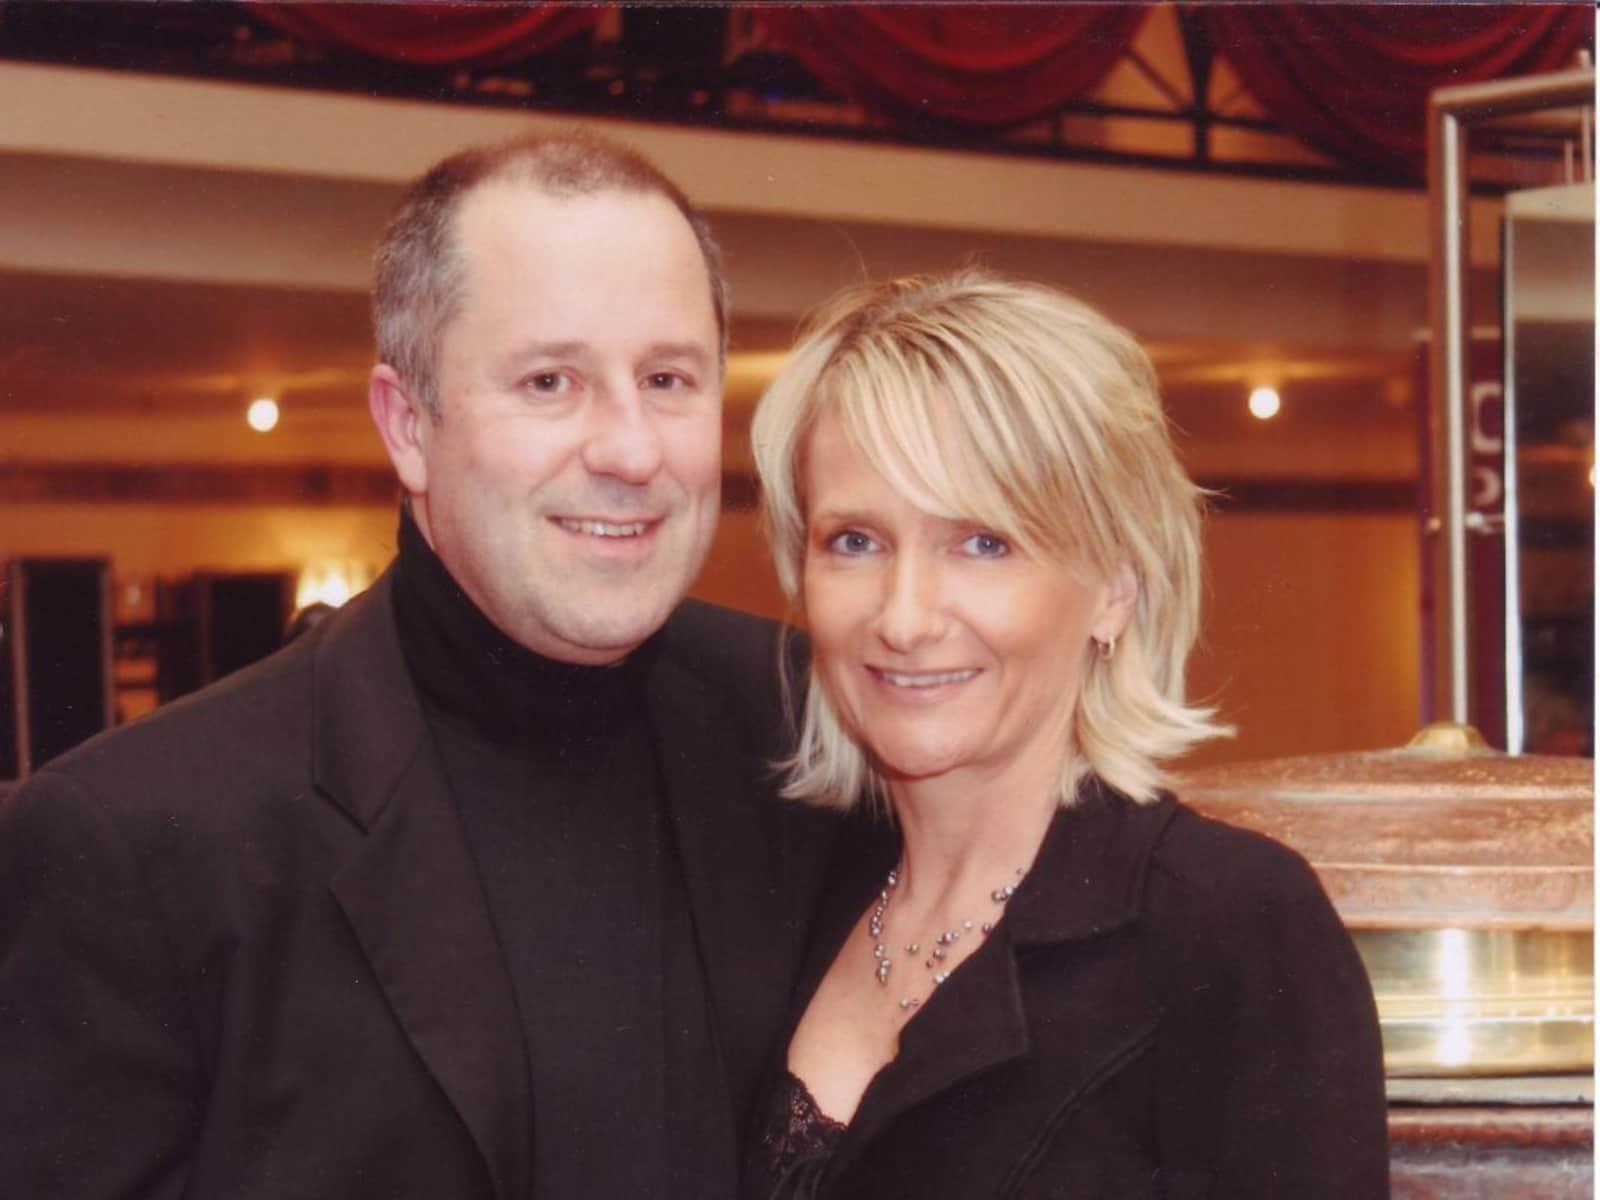 Martina & Robert from Neu-Anspach, Germany